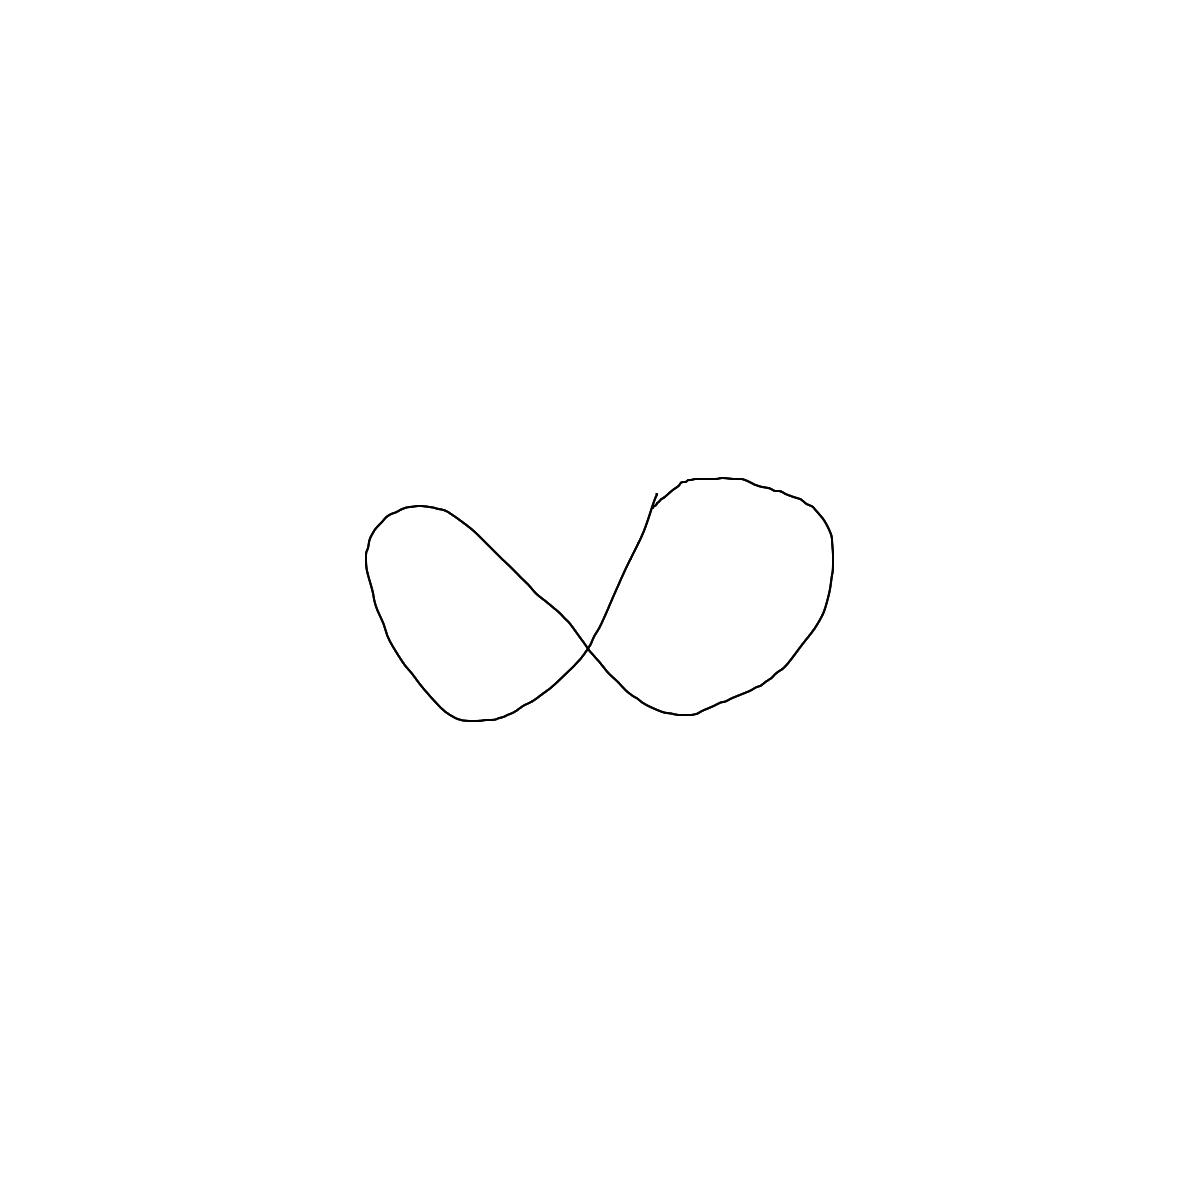 BAAAM drawing#675 lat:55.0201301574707000lng: -1.4248272180557250